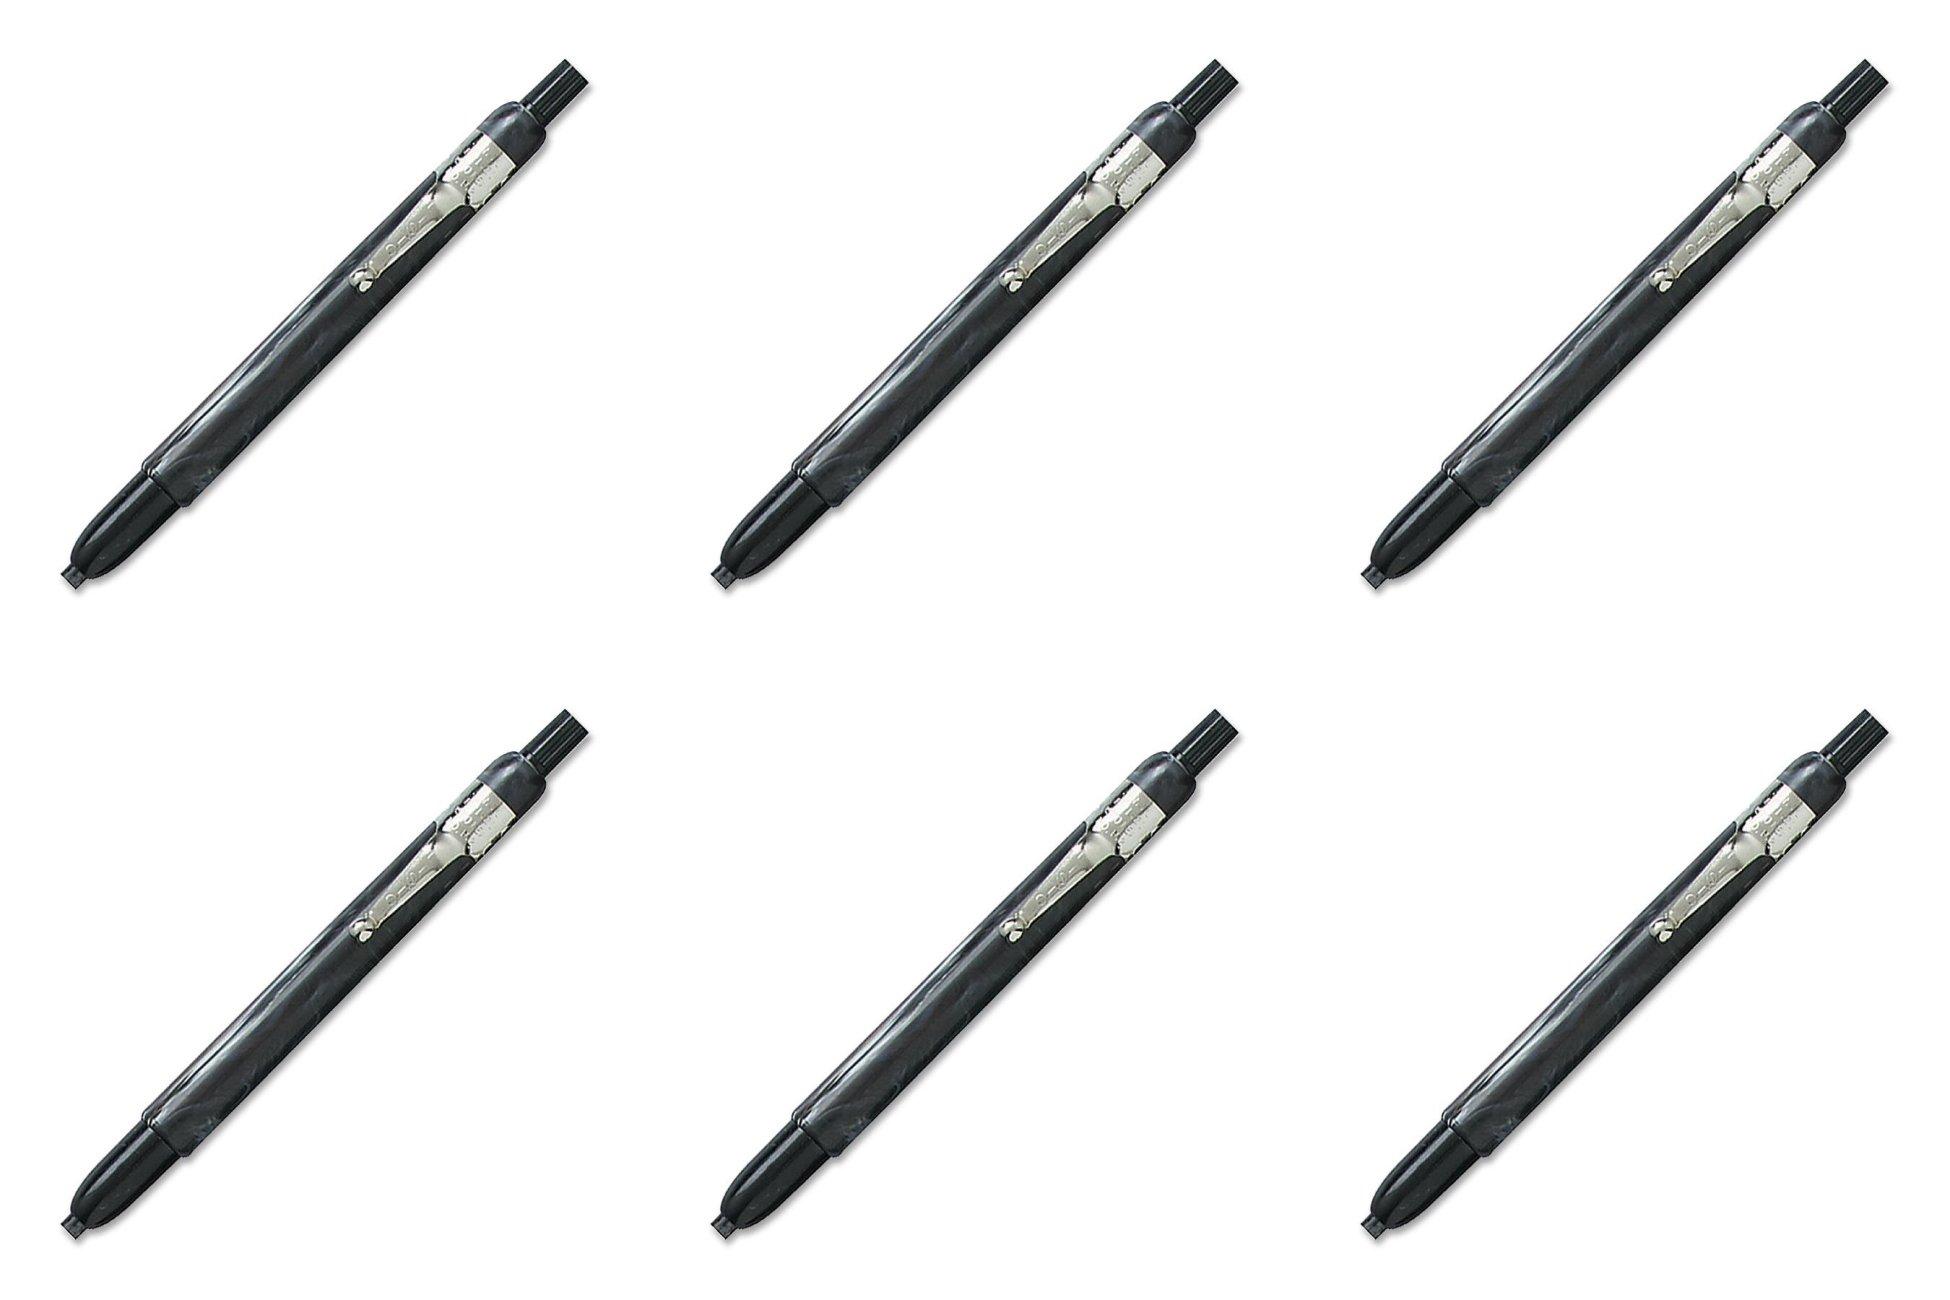 Listo 1620 Marking Pencil, Box of 12, BLACK, 6 Packs